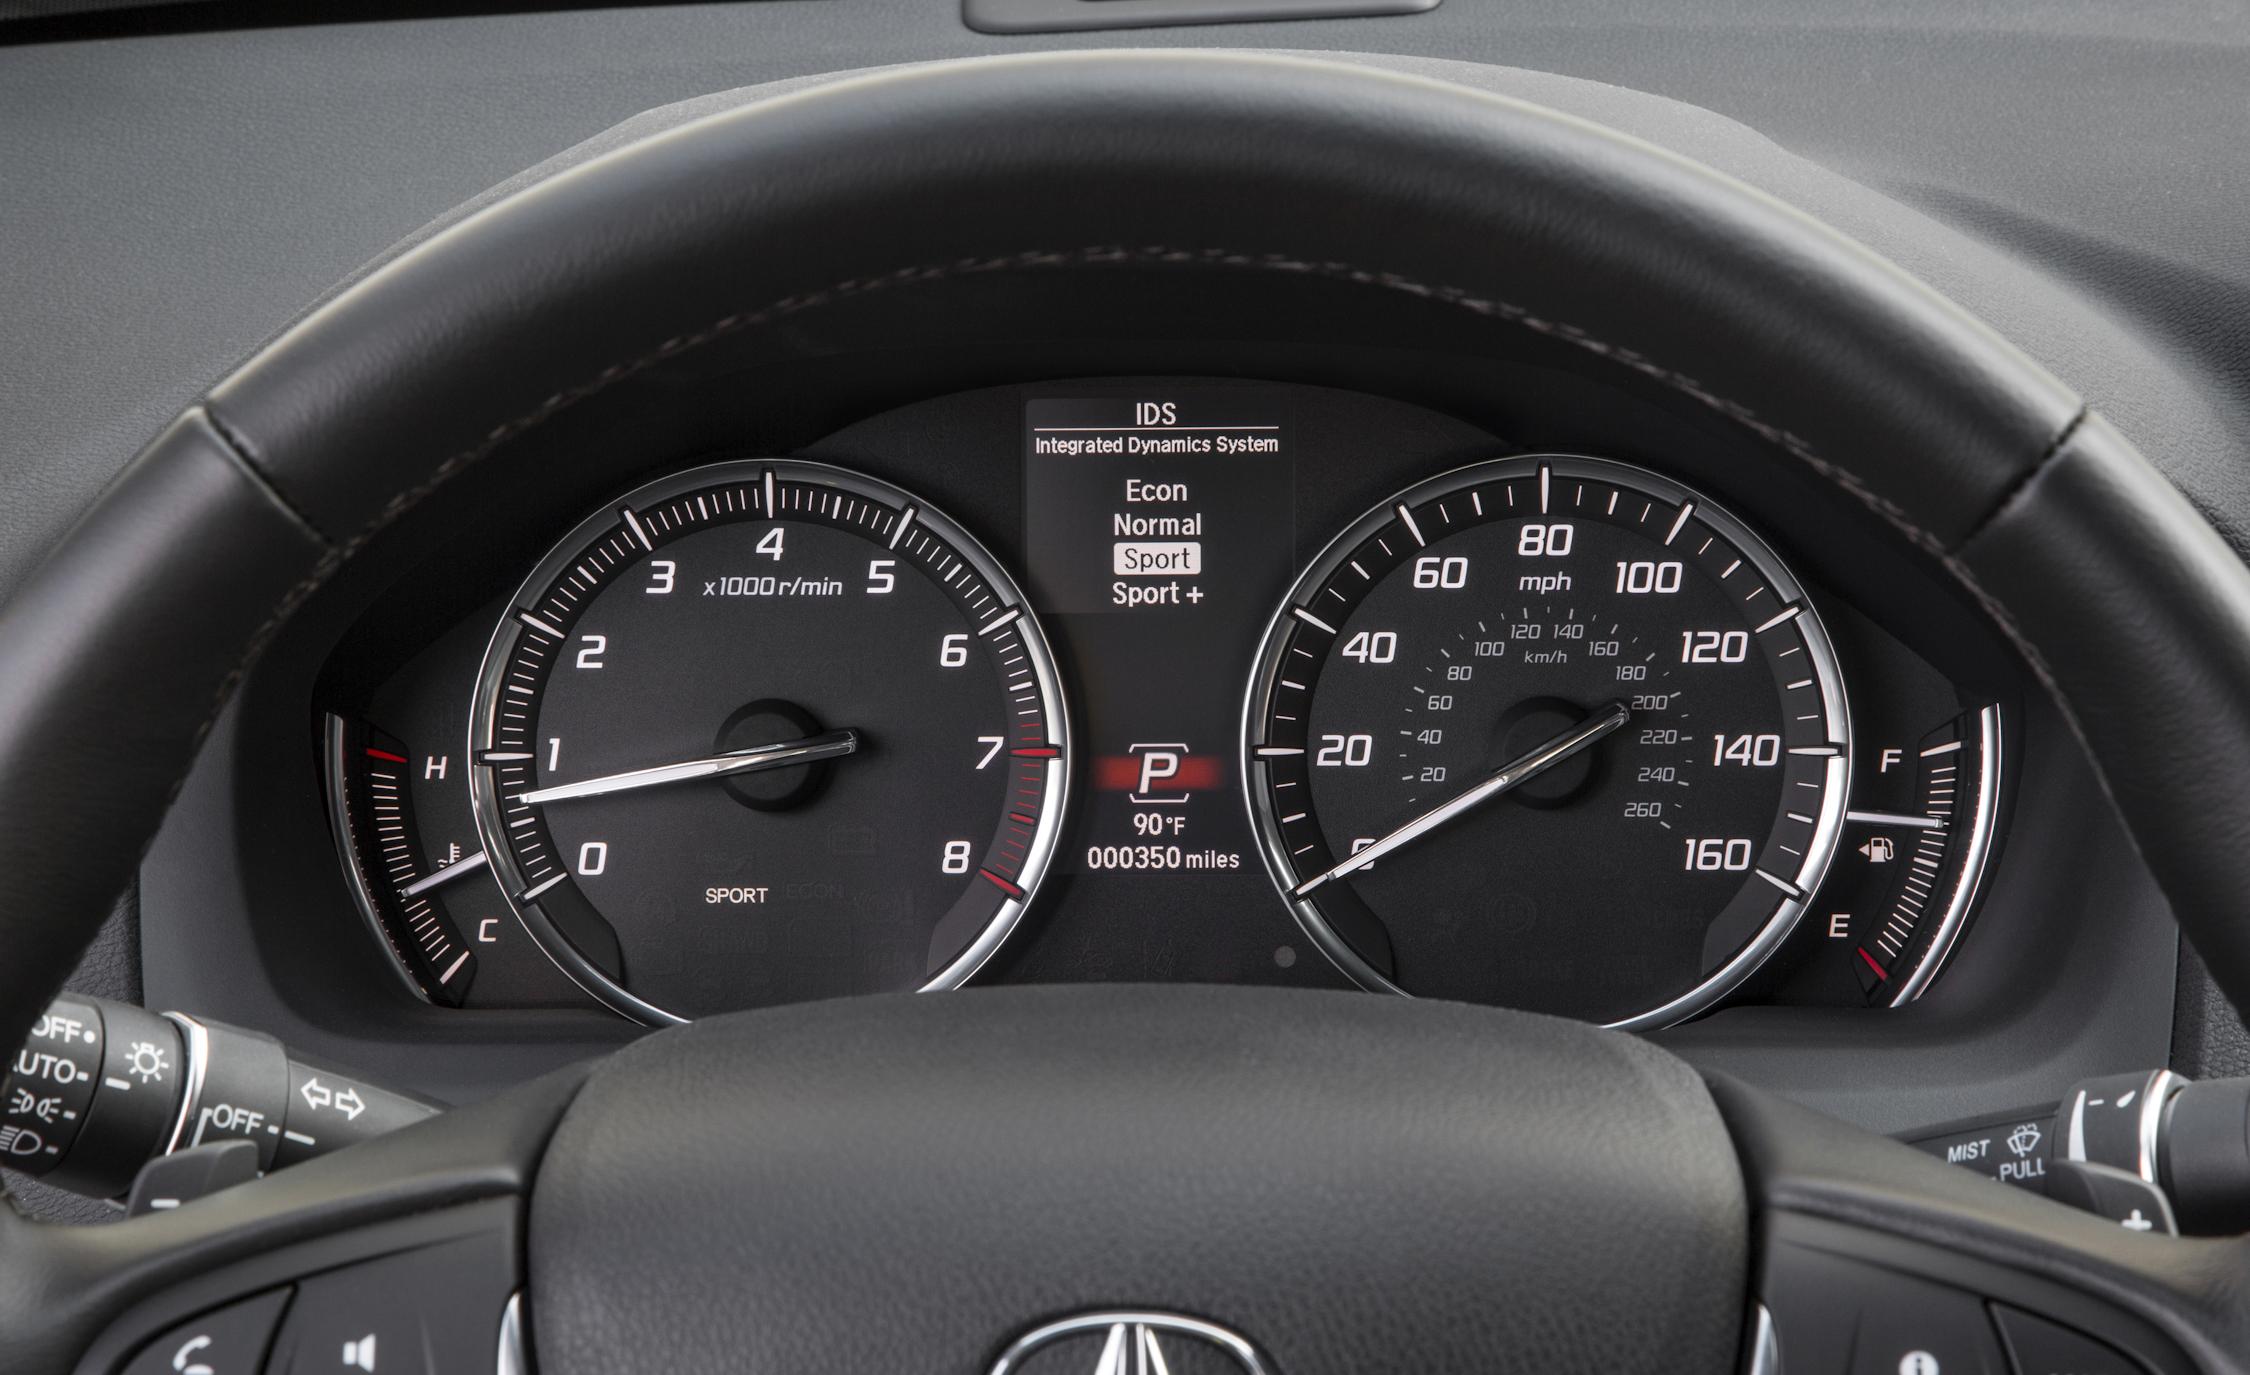 2015 Acura TLX 3.5L SH-AWD Interior Speedometer